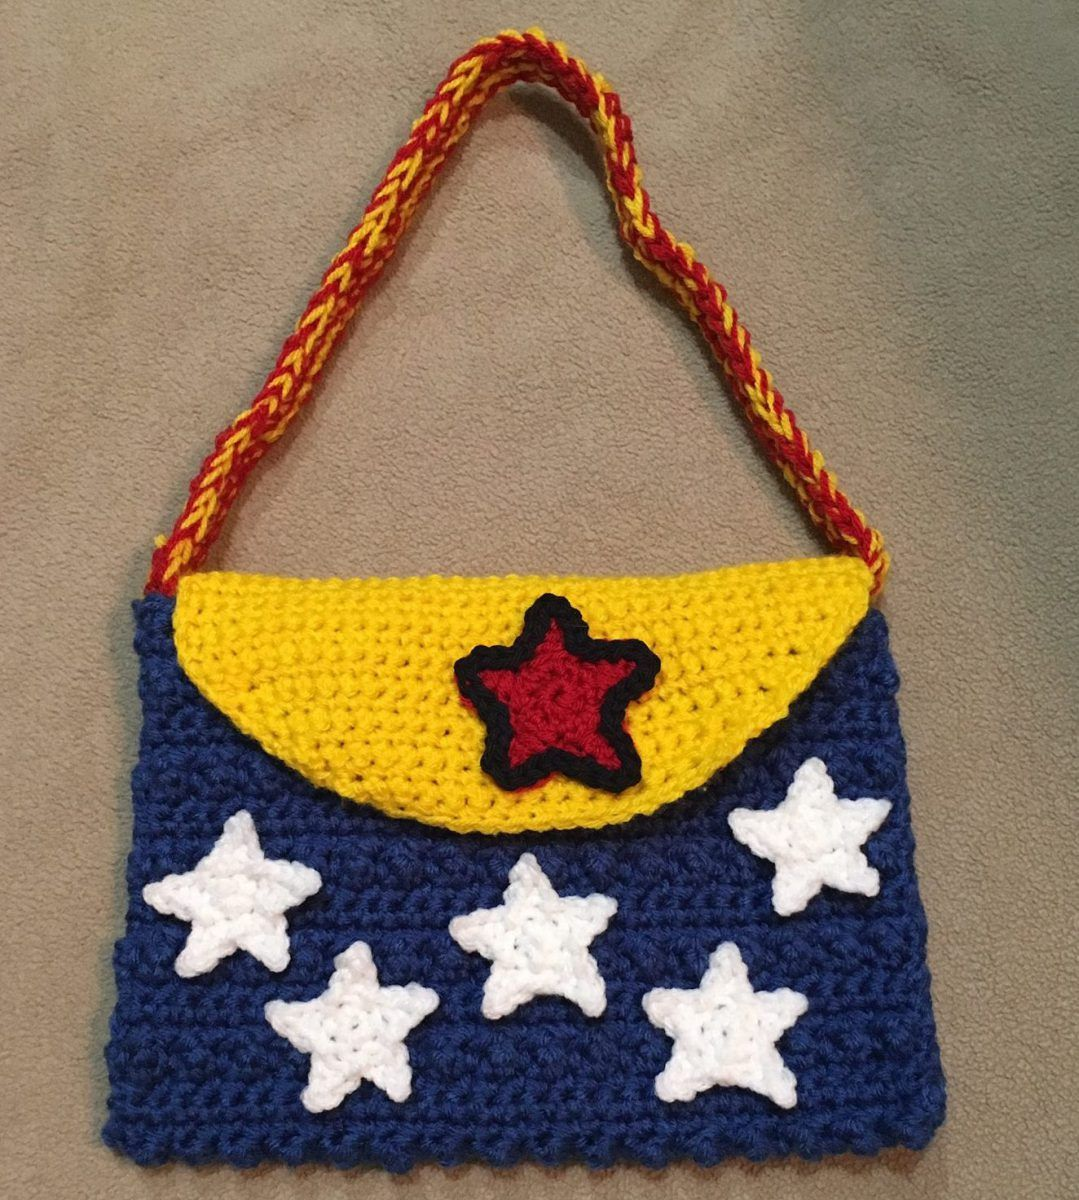 Wonder Woman crochet purse pattern   Crochet   Pinterest   Crochet ...